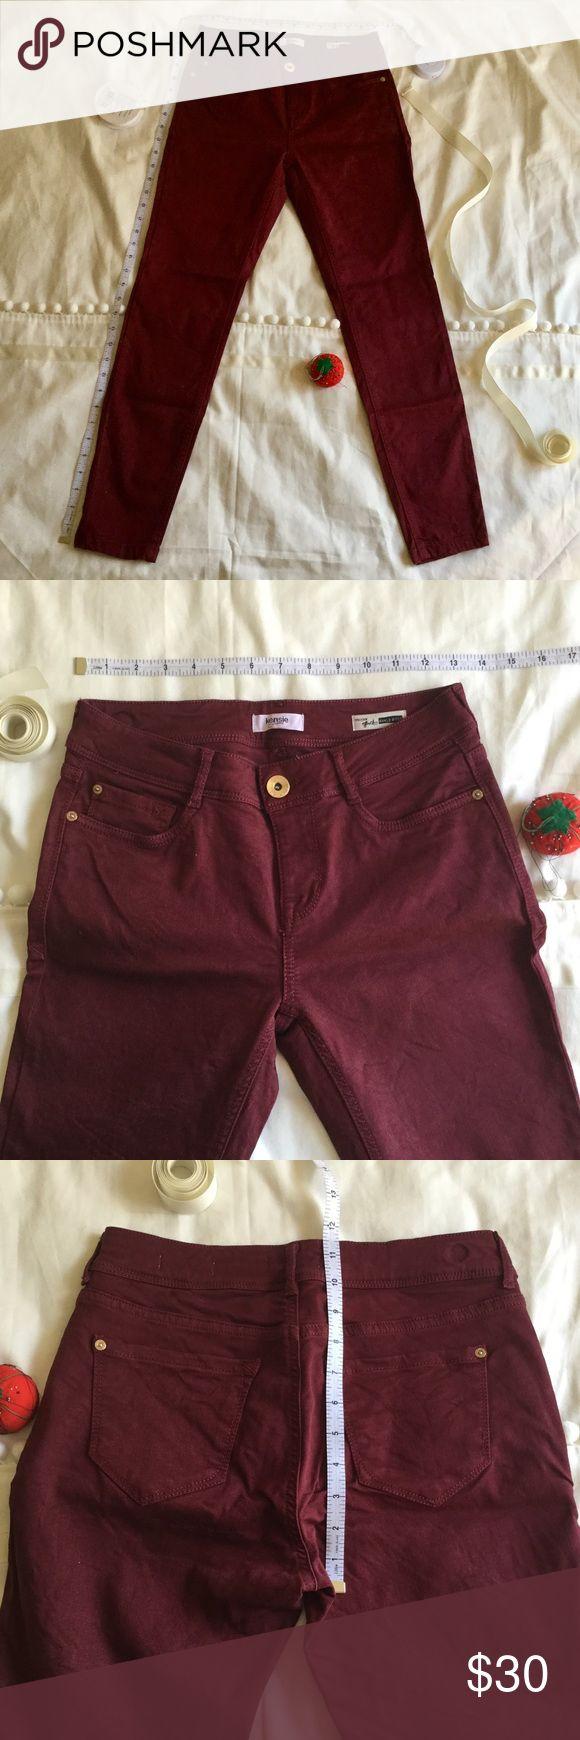 "Kensie Jeans Skinny Jeans in Burgundy Skinny jeans in burgundy by Kensie Jeans. Effortless Ankle Biter style. Size 25. ~36.5"" length, ~13"" waist, ~27.5"" inseam. Gently worn a few times. Kensie Jeans Skinny"